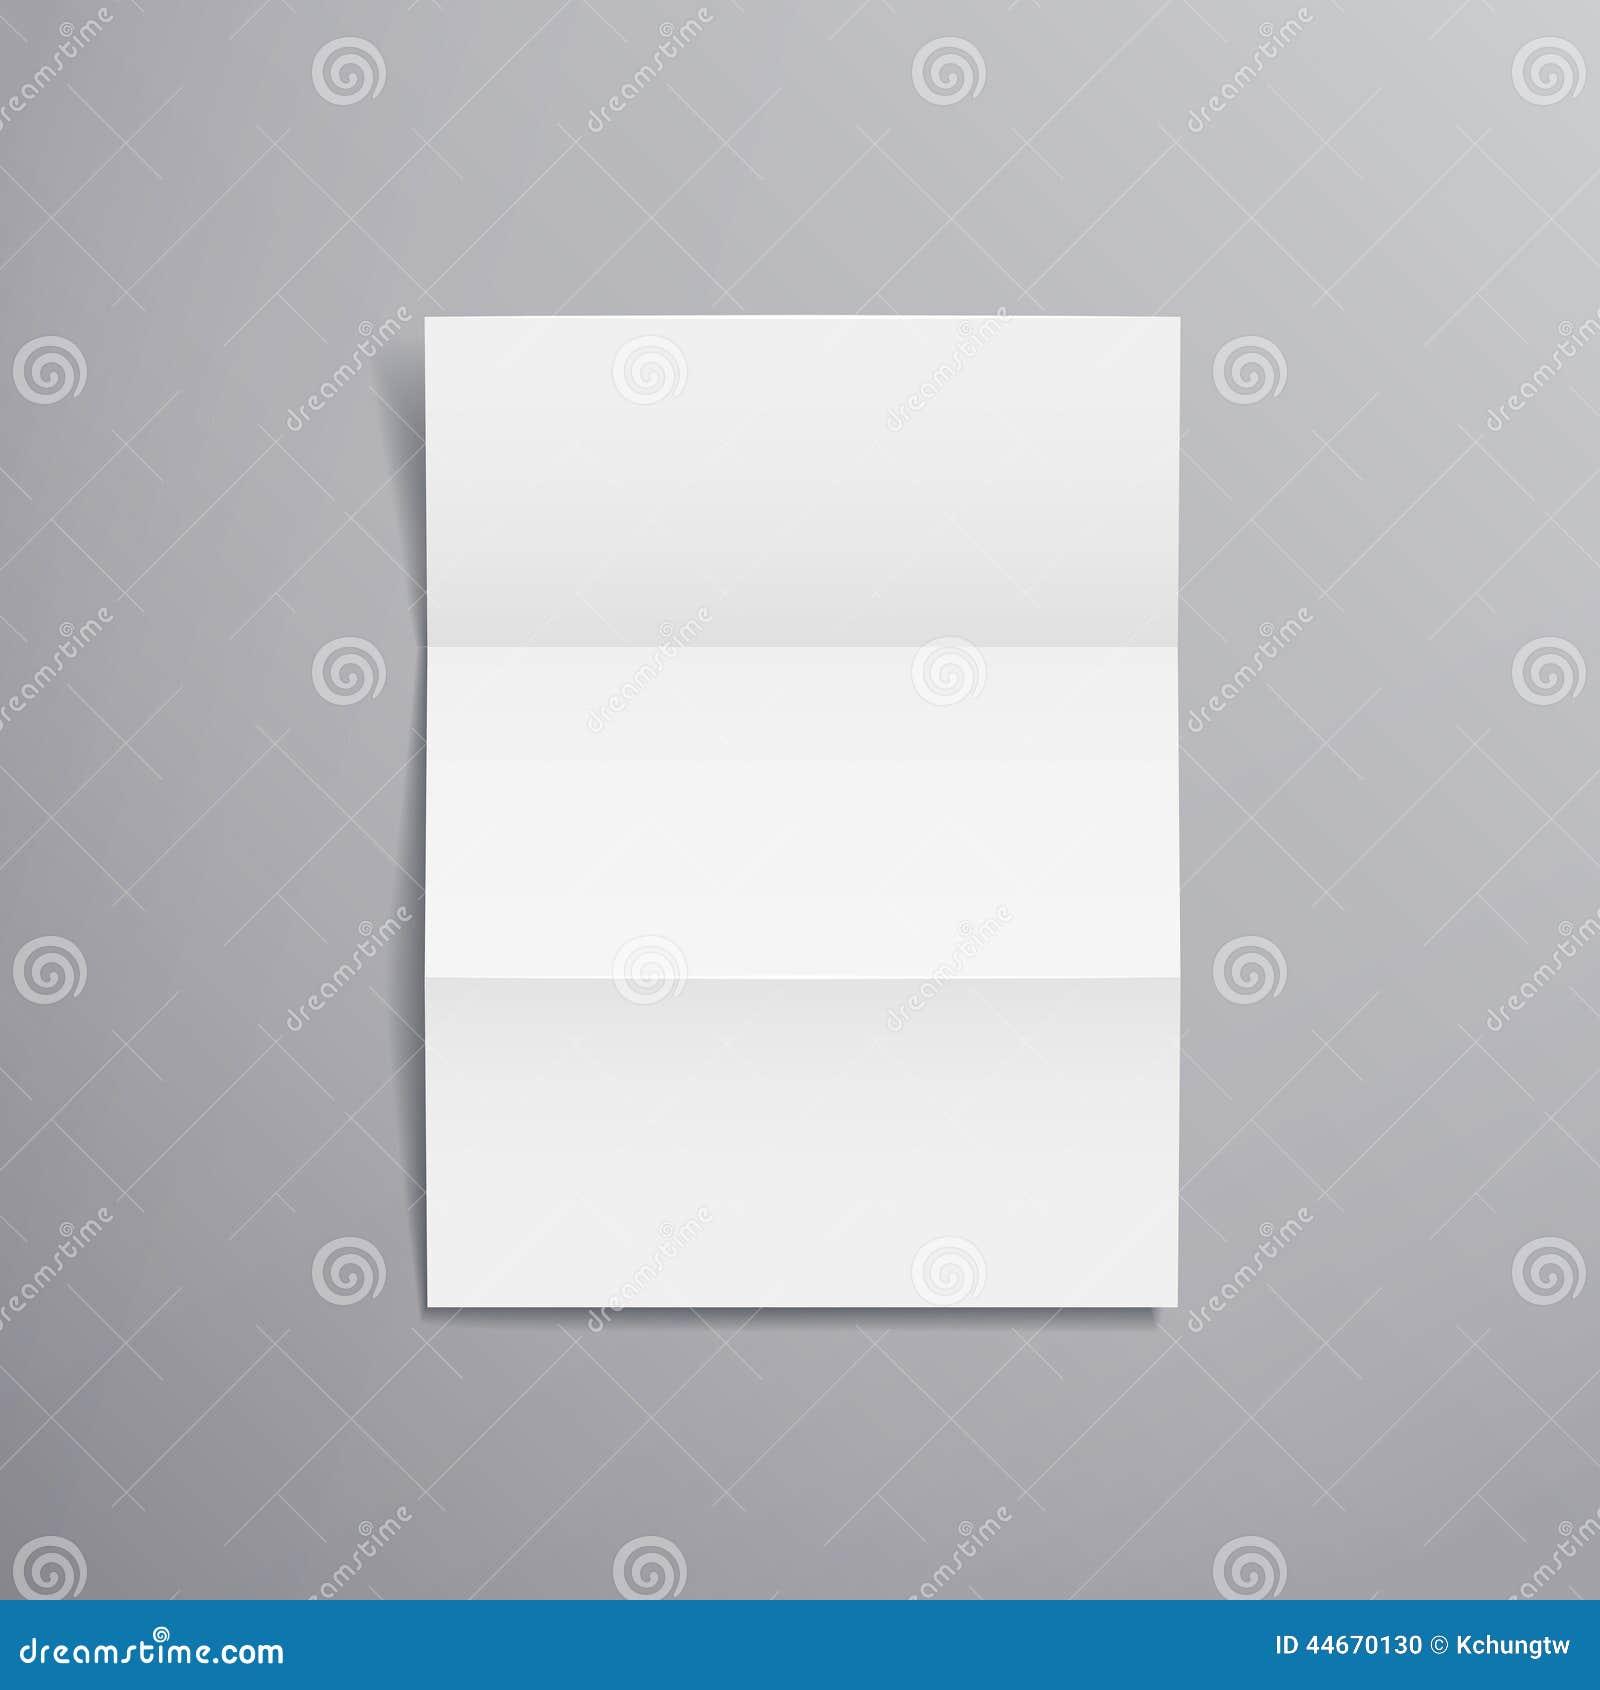 Paper Blank Brochure Template Stock Vector Illustration Of Element